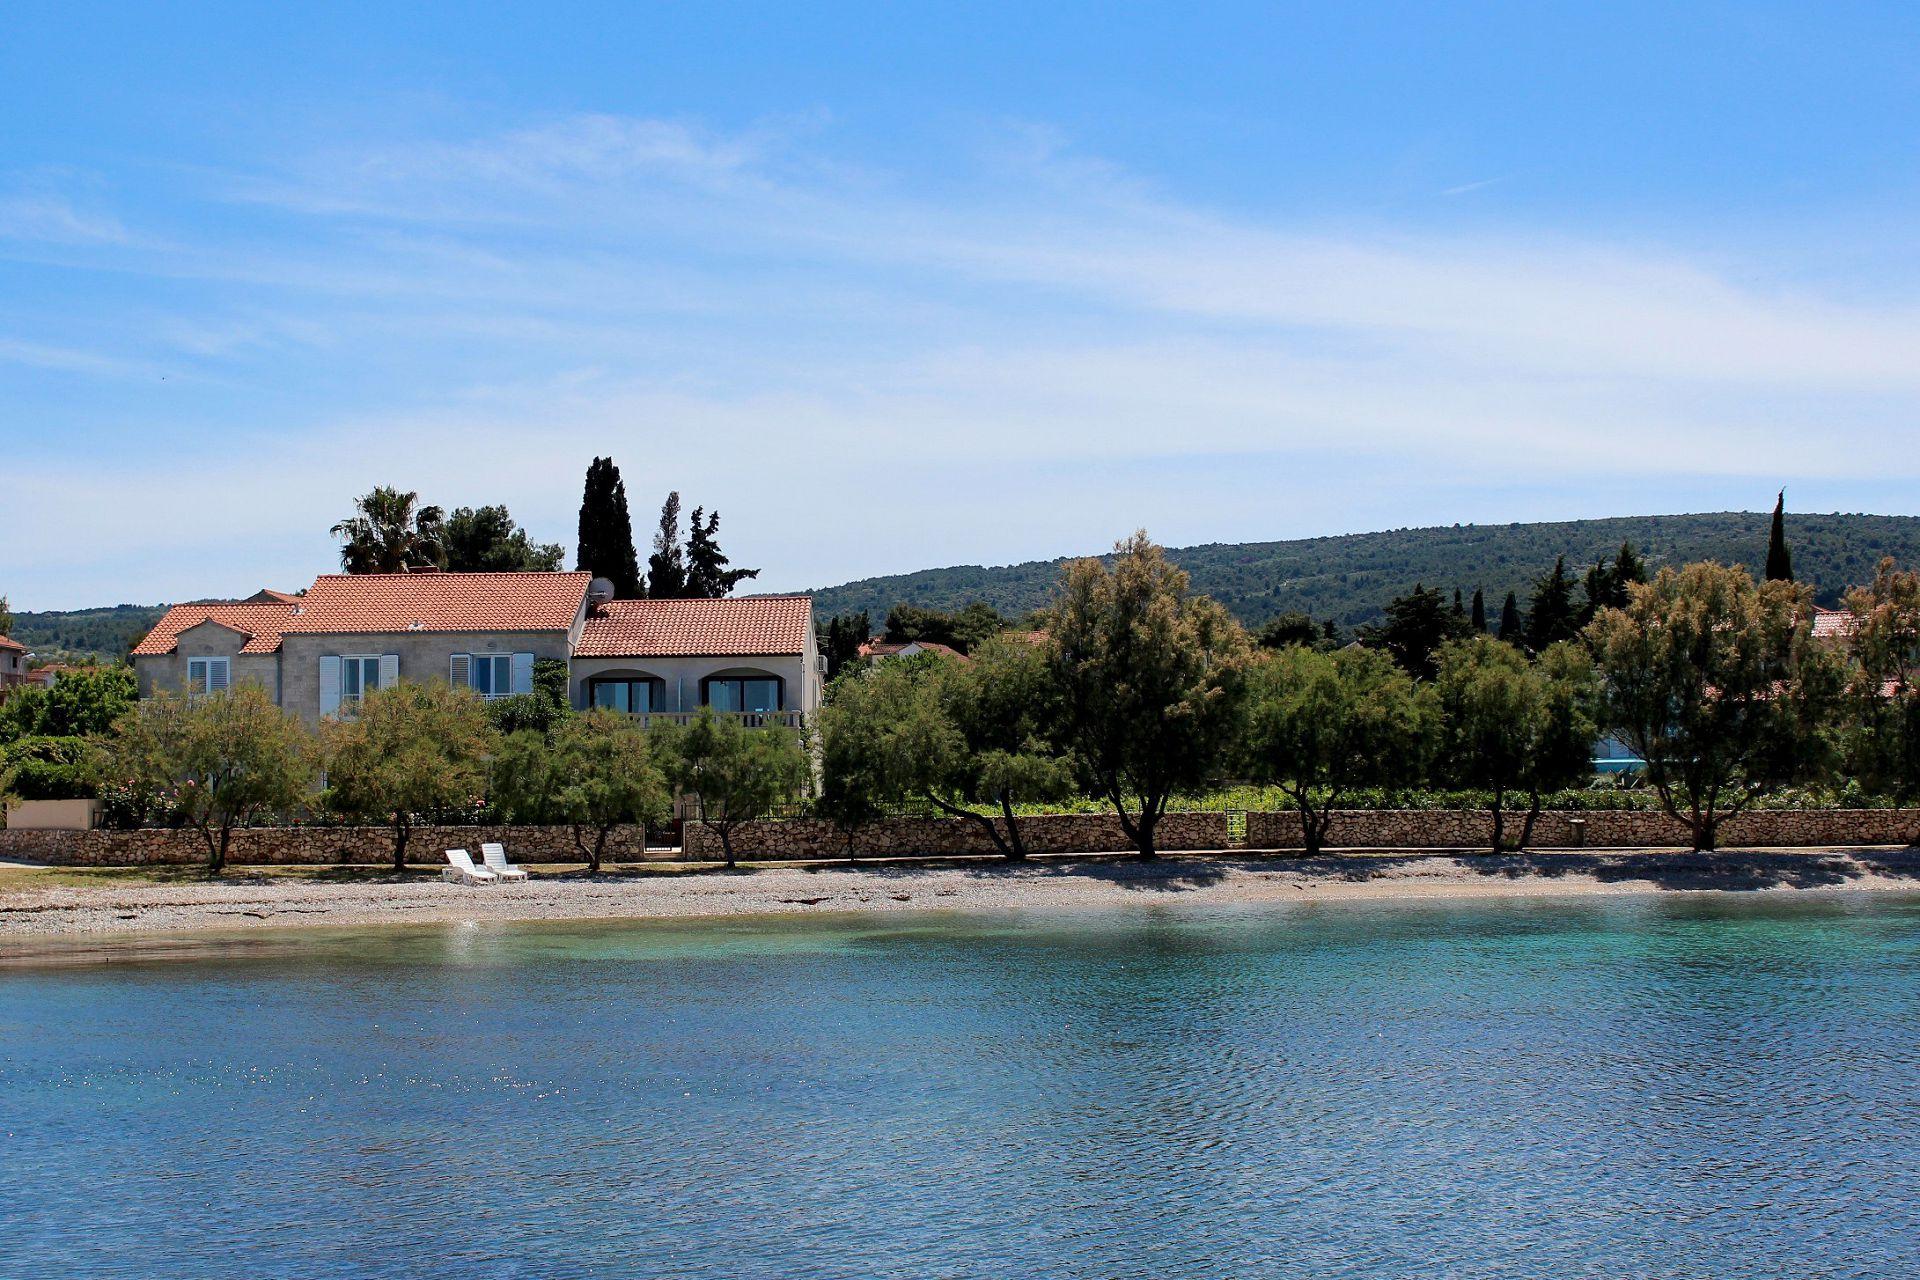 6018 - Mirca - Holiday houses, villas Croatia